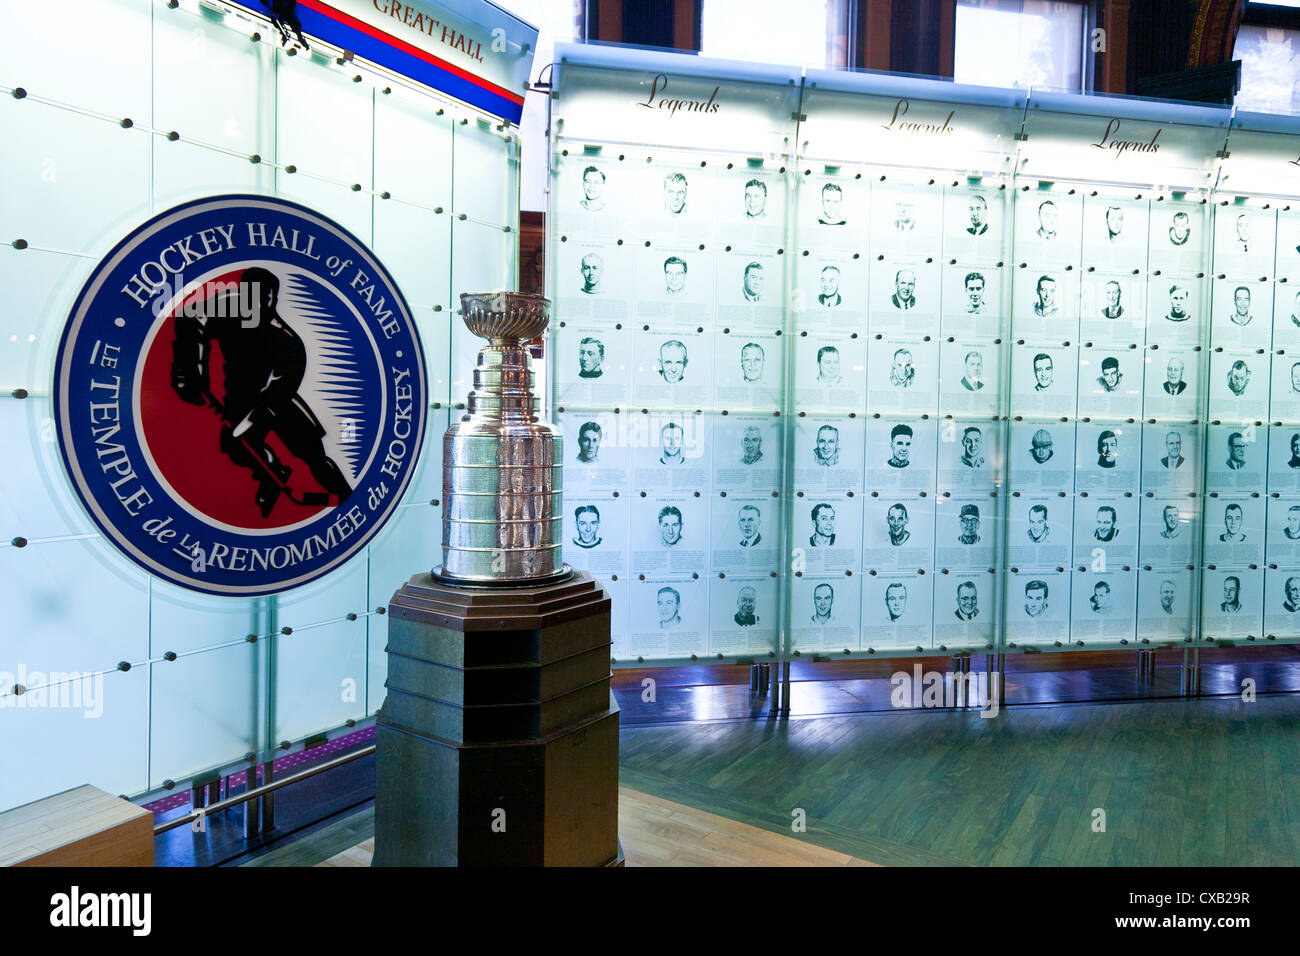 Hockey Hall of Fame, Toronto, Ontario, Canada, America del Nord Immagini Stock